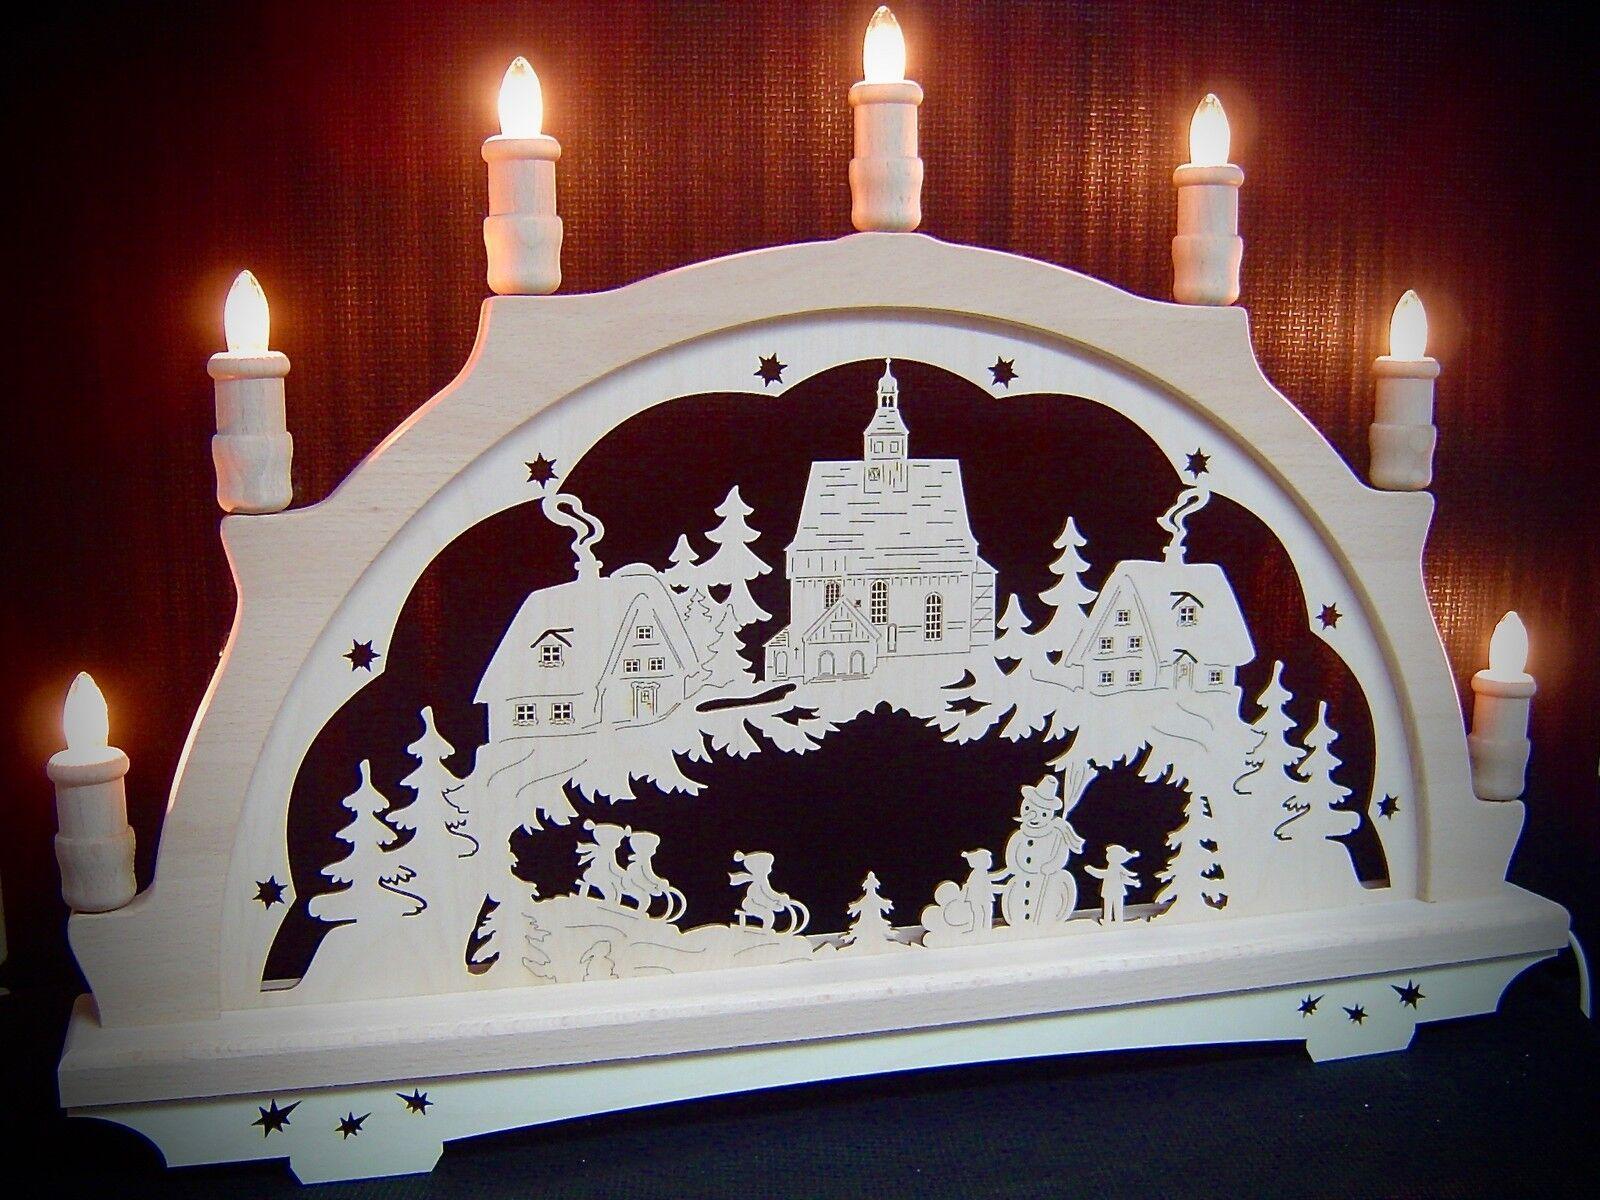 Original Erzgebirge Arco Arco de Luces Aldea de Invierno Iglesia 7 Velas 10266